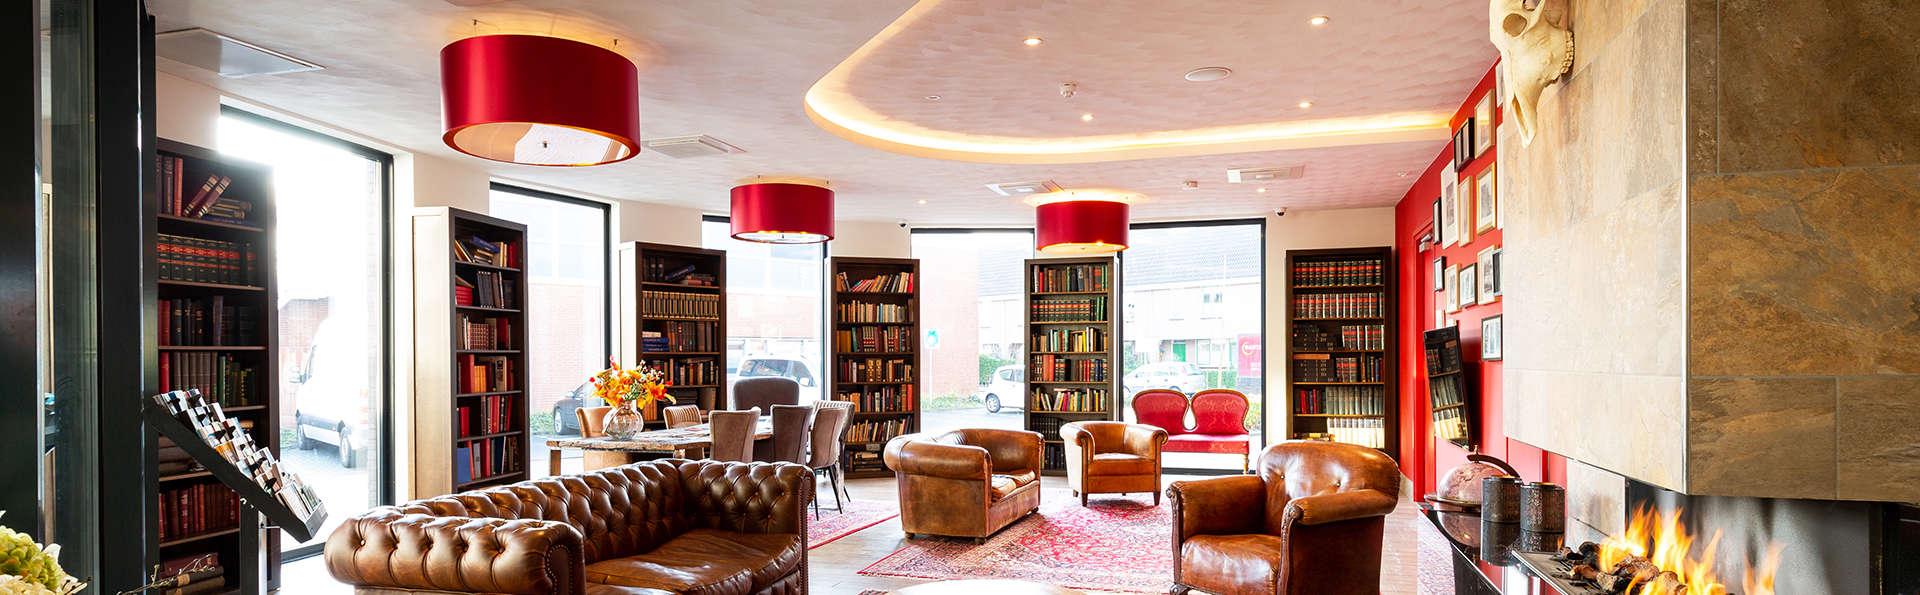 Bastion Hotel Brielle Europoort - EDIT_LoungeLobby_1.jpg